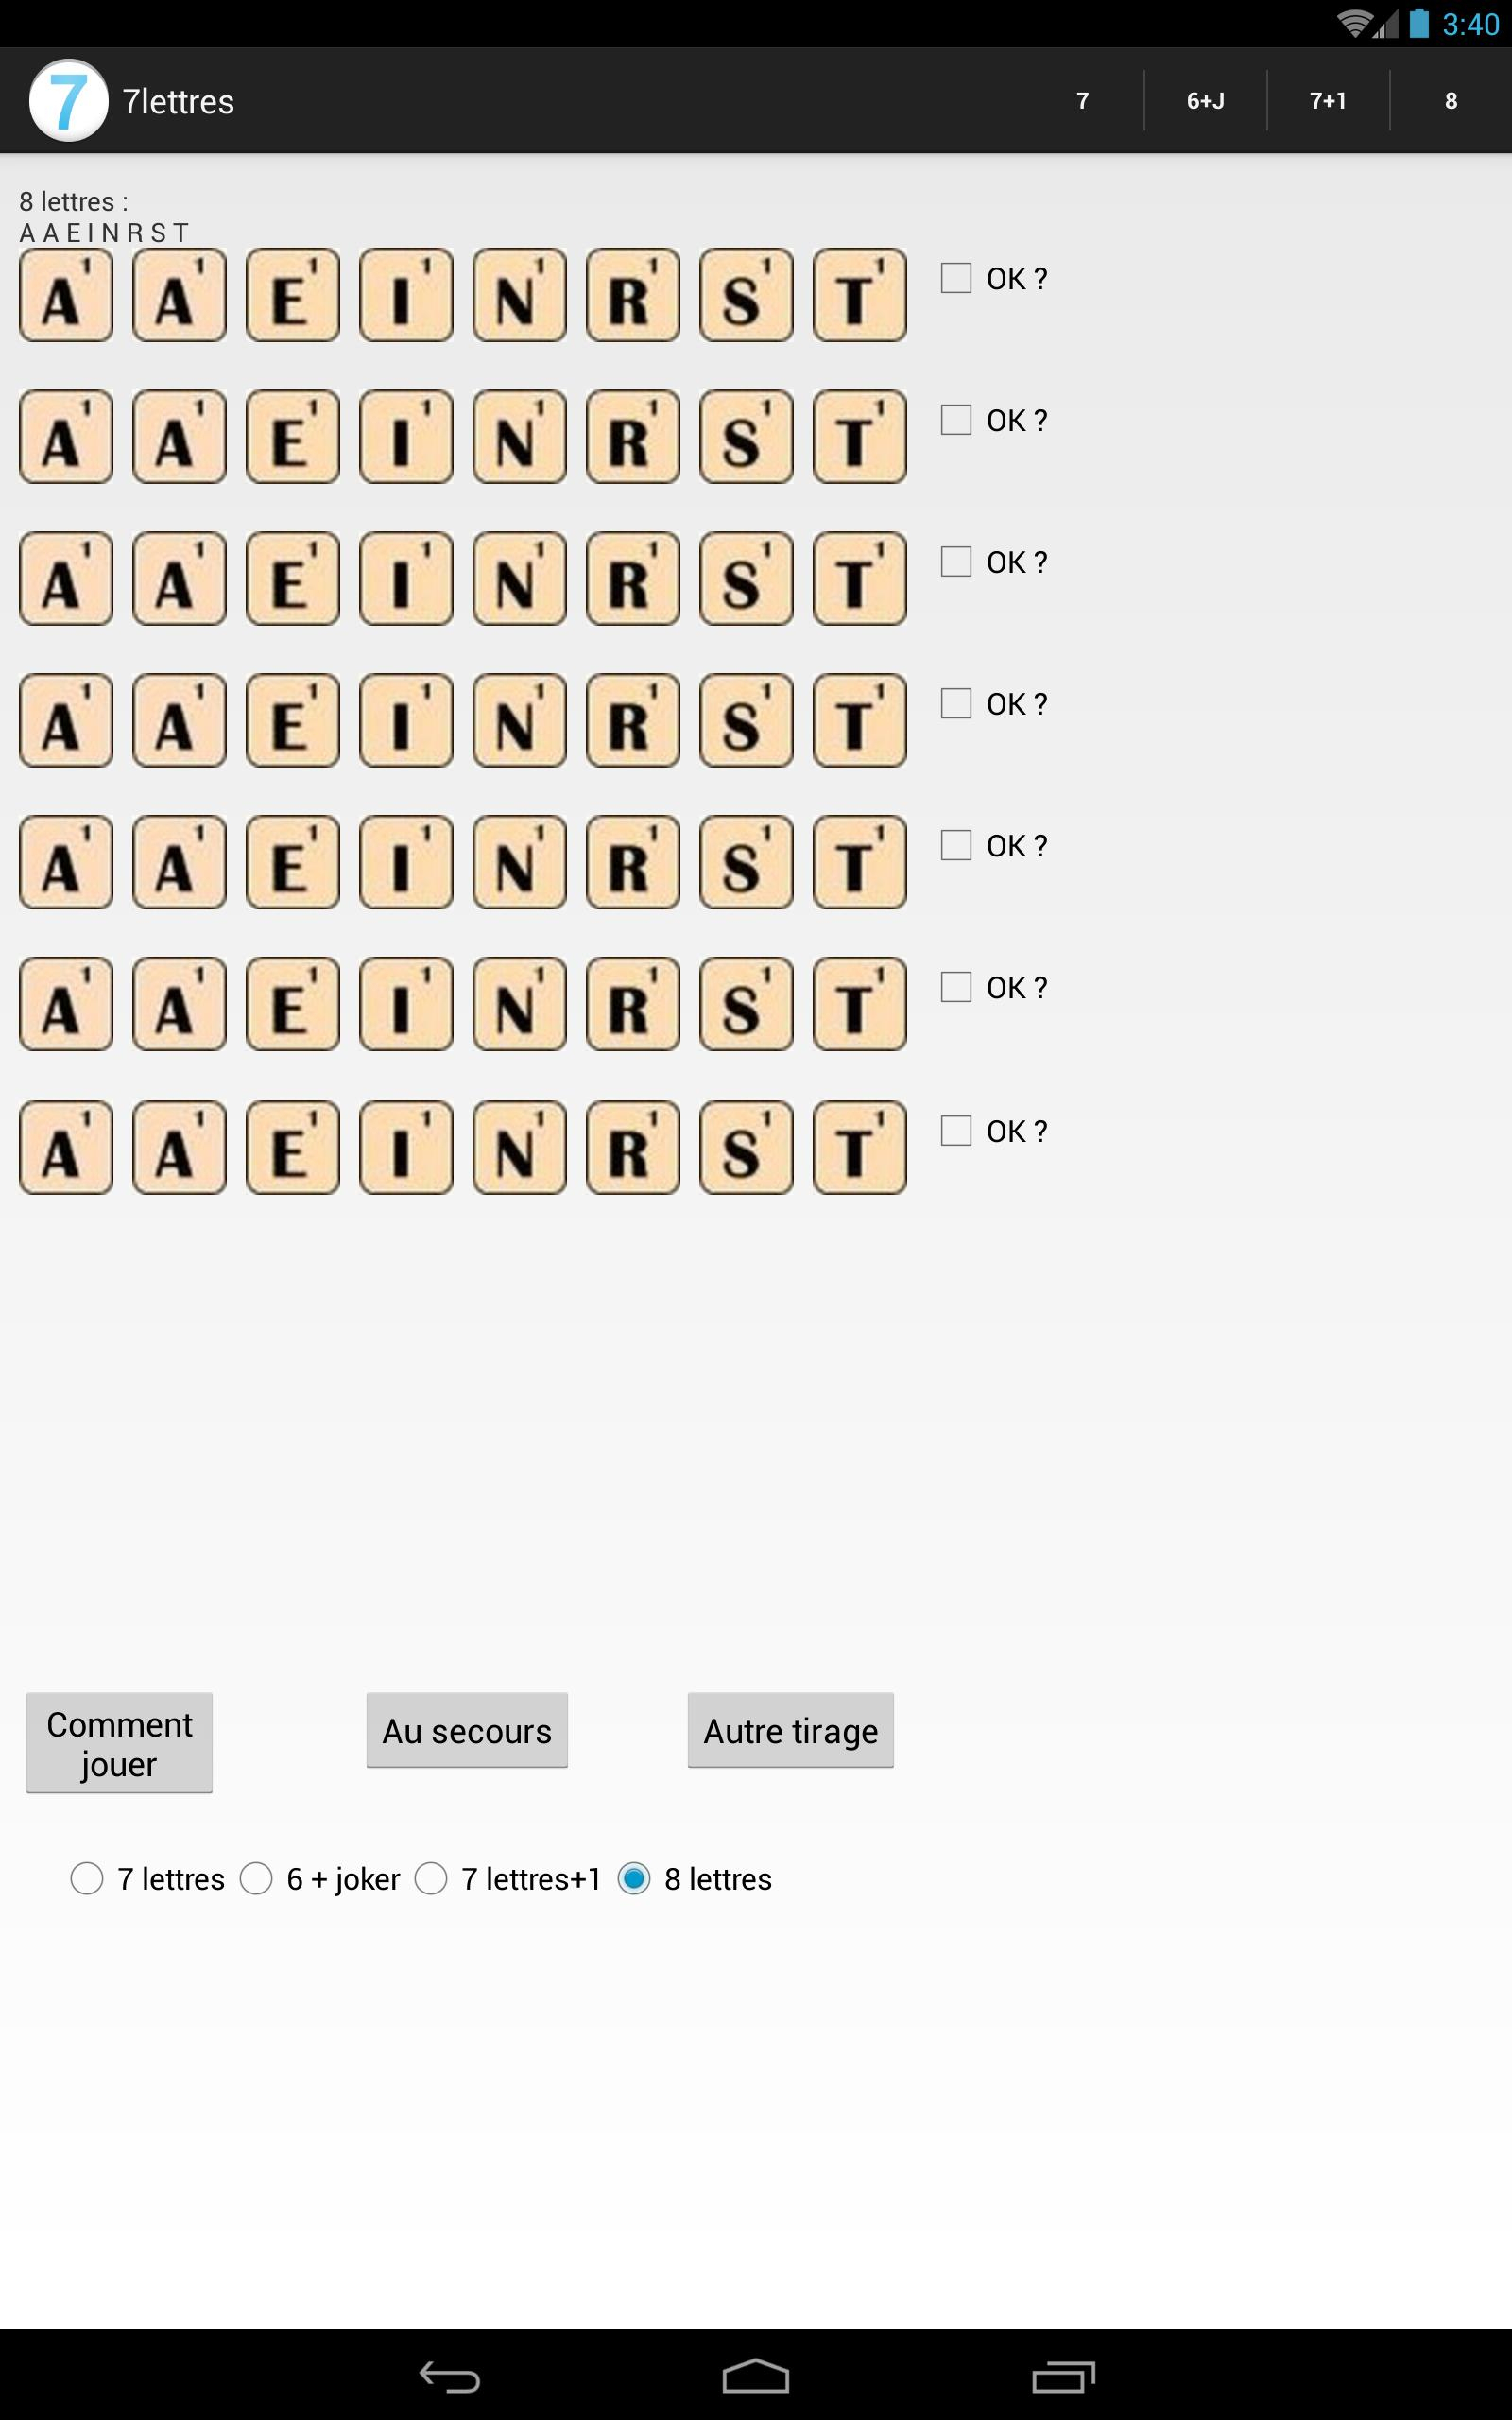 Anagrammes 7 Lettres For Android - Apk Download avec Jeux Anagramme Gratuit A Telecharger